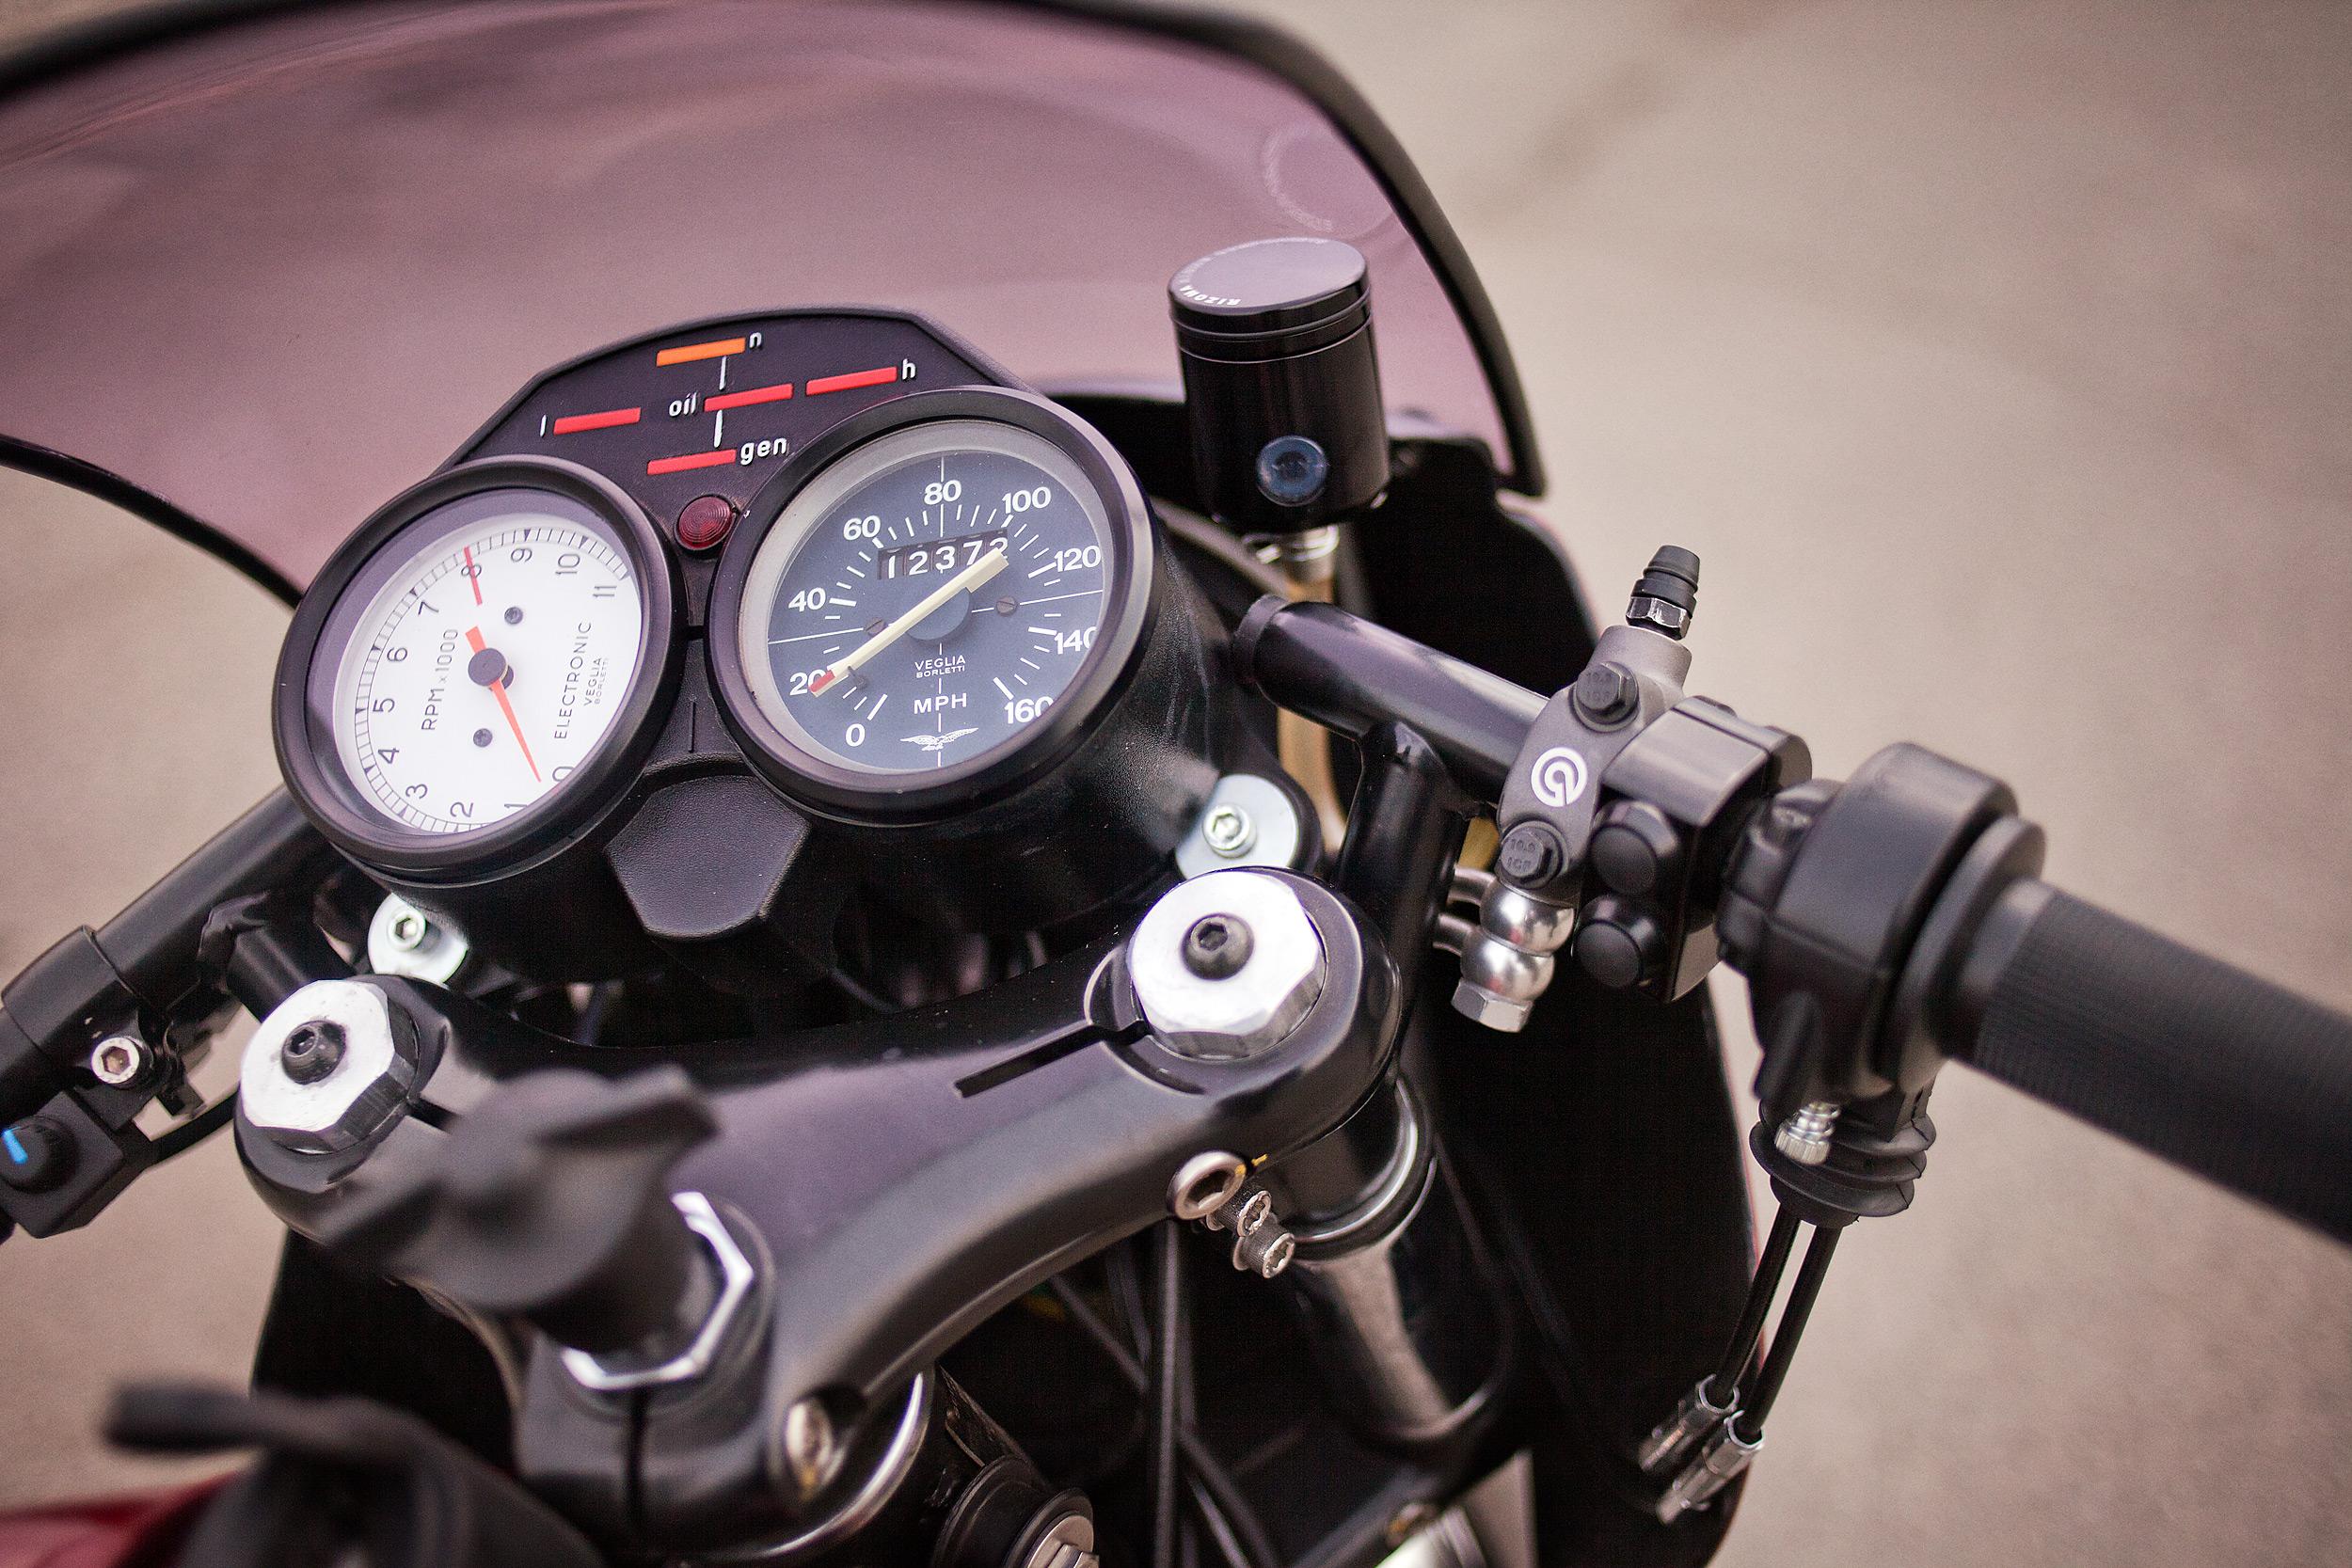 1977 Moto Guzzi lemans 1 custom dash